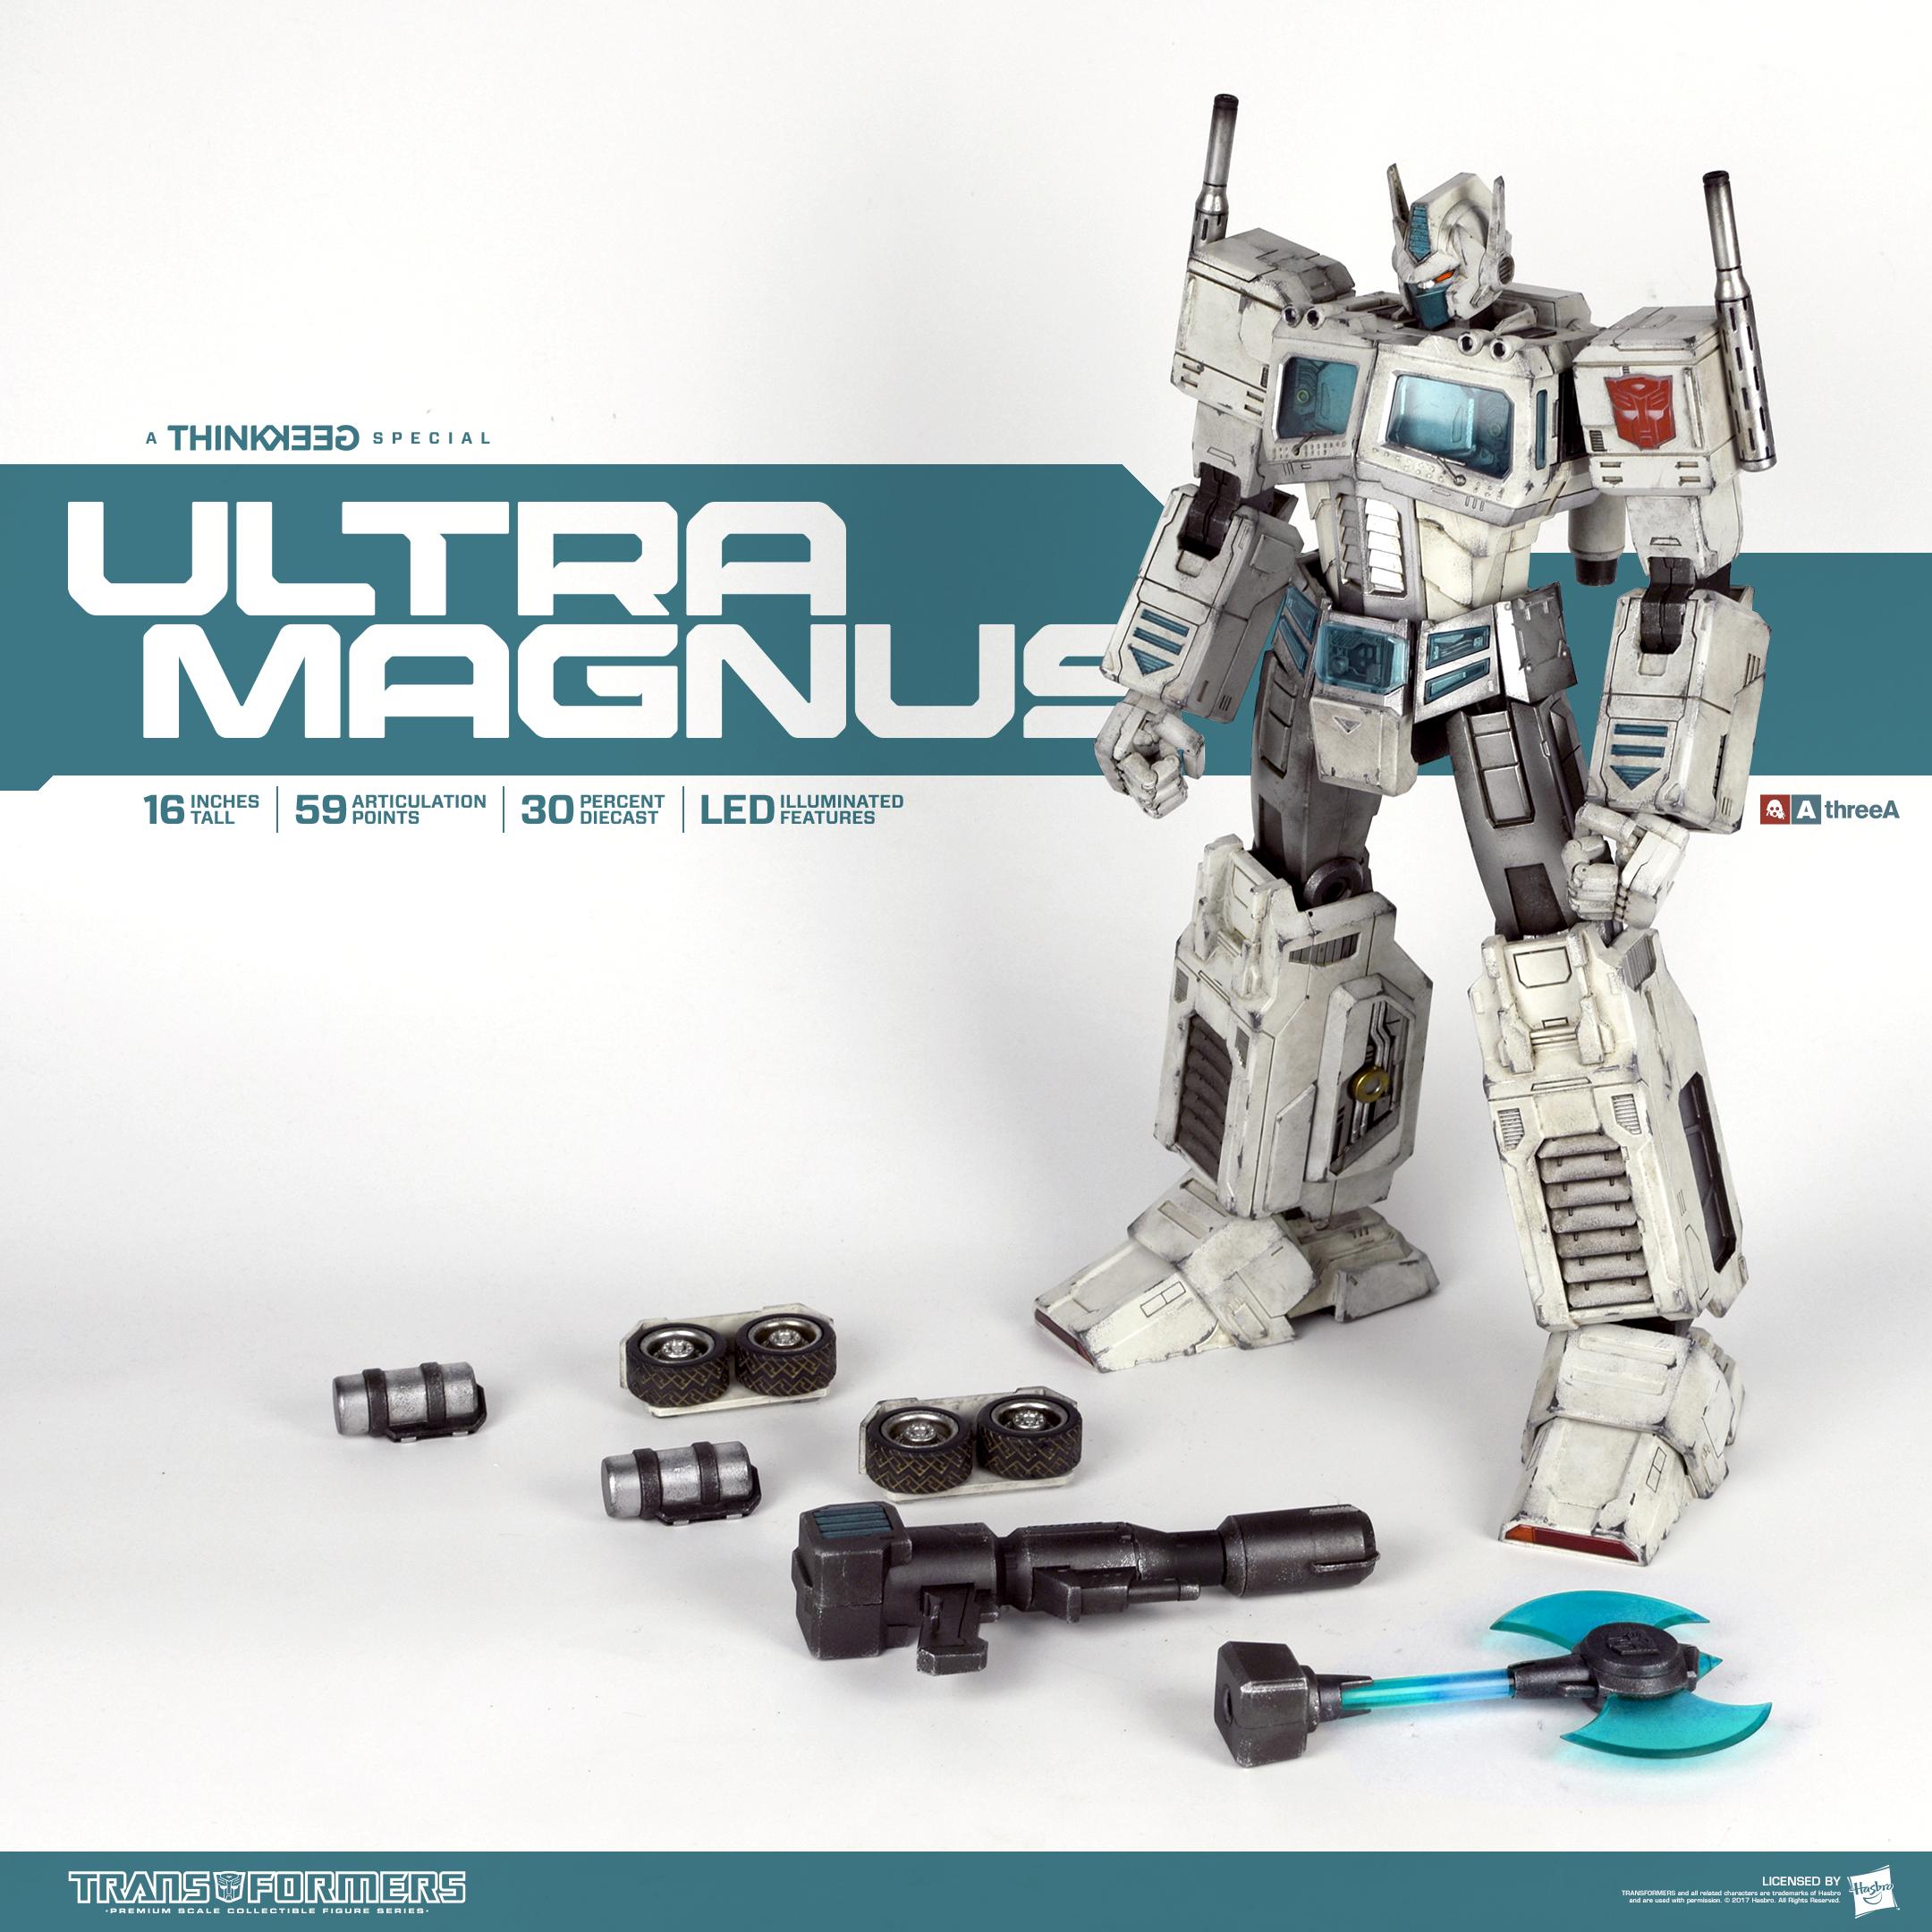 3A_Transformers_G1_UltraMagnus_2160x2160_v001a.png